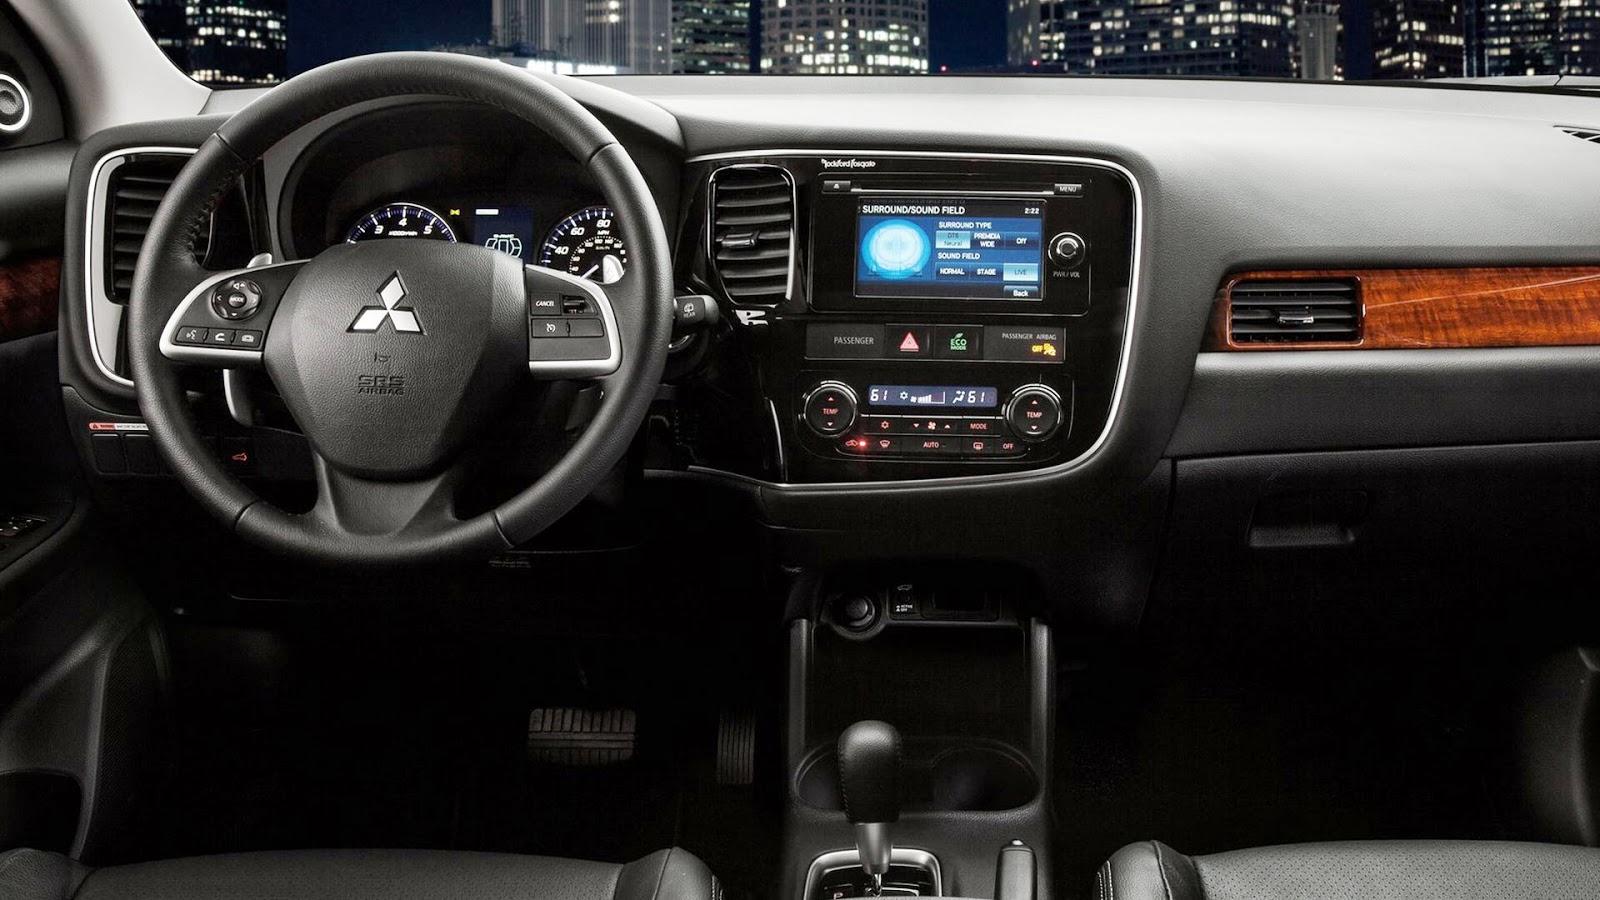 Latest cars models mitsubishi outlander 2013 - Mitsubishi outlander 2014 interior ...